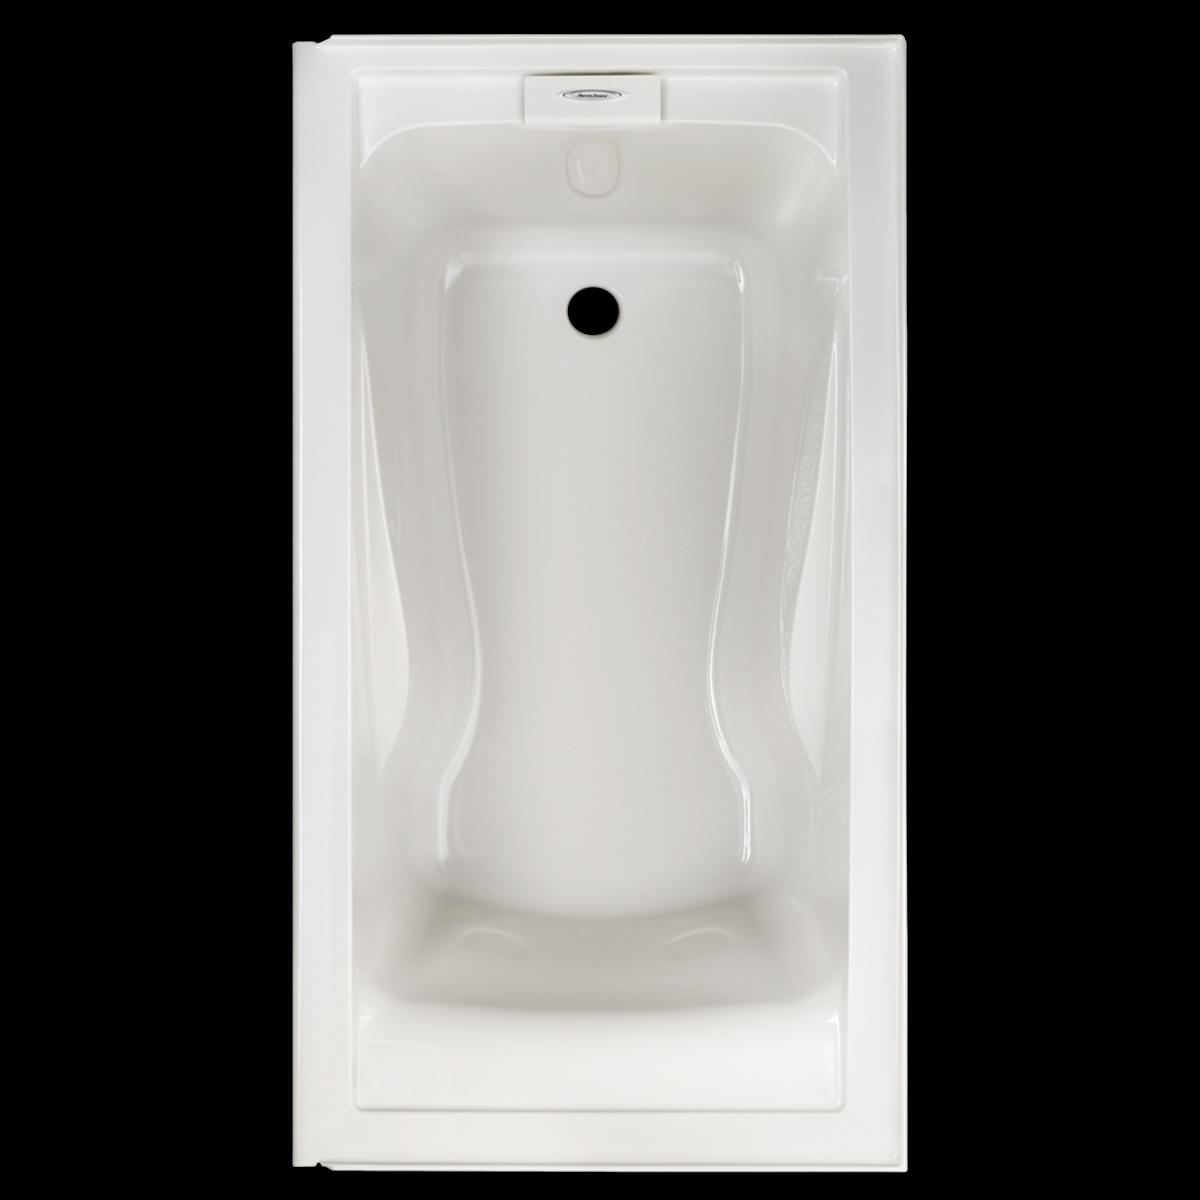 Evolution 60x32 inch Deep Soak Bathtub - American Standard ...